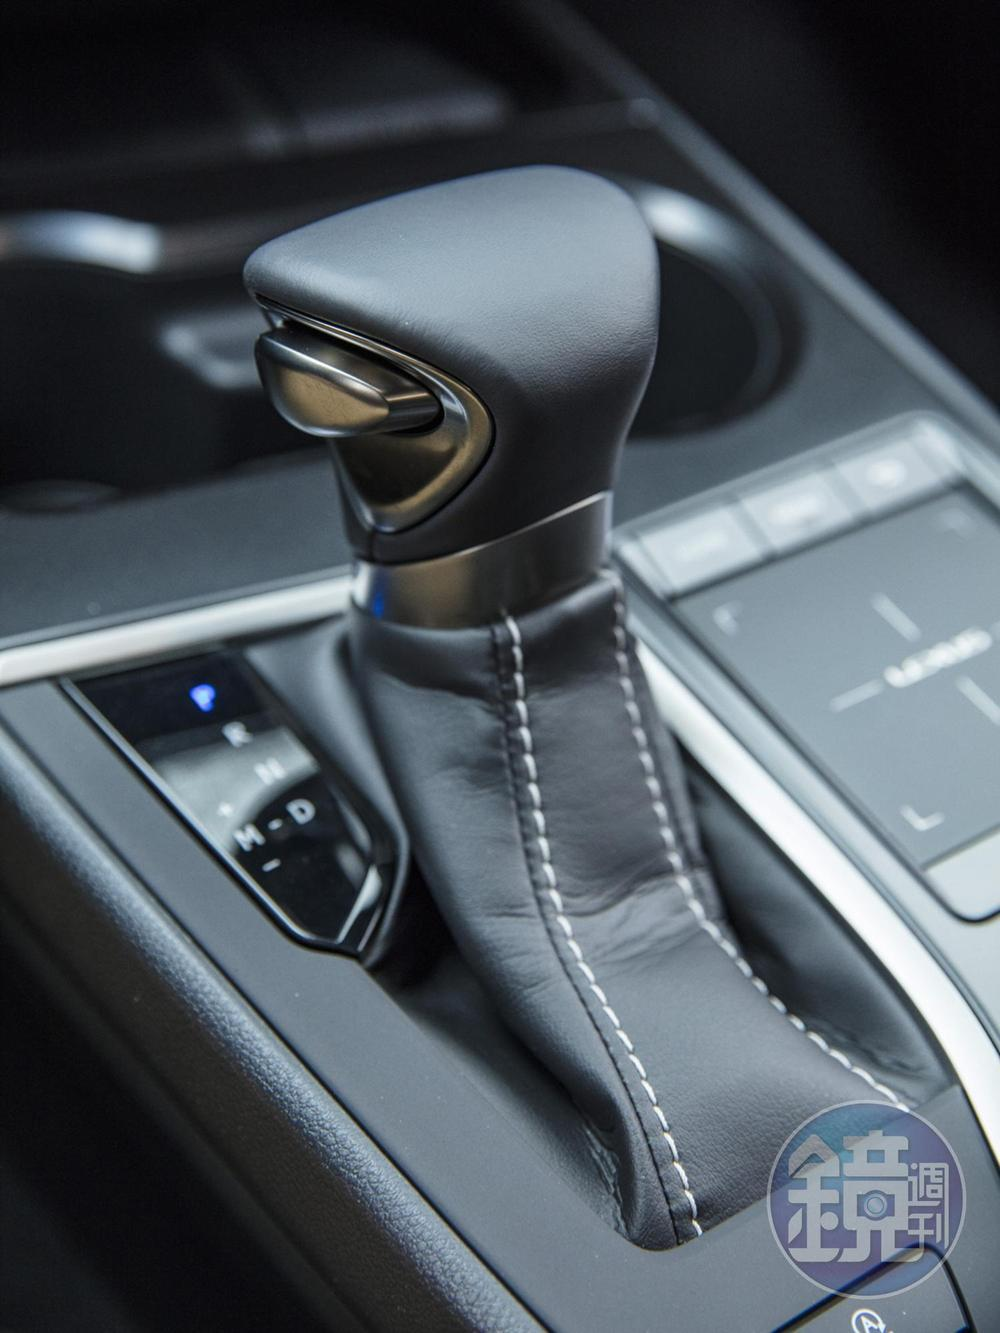 Direct Shift-CVT 無段變速系統,採用特殊的 Launch Gear 起步齒輪設計,可手動模擬十段變速。